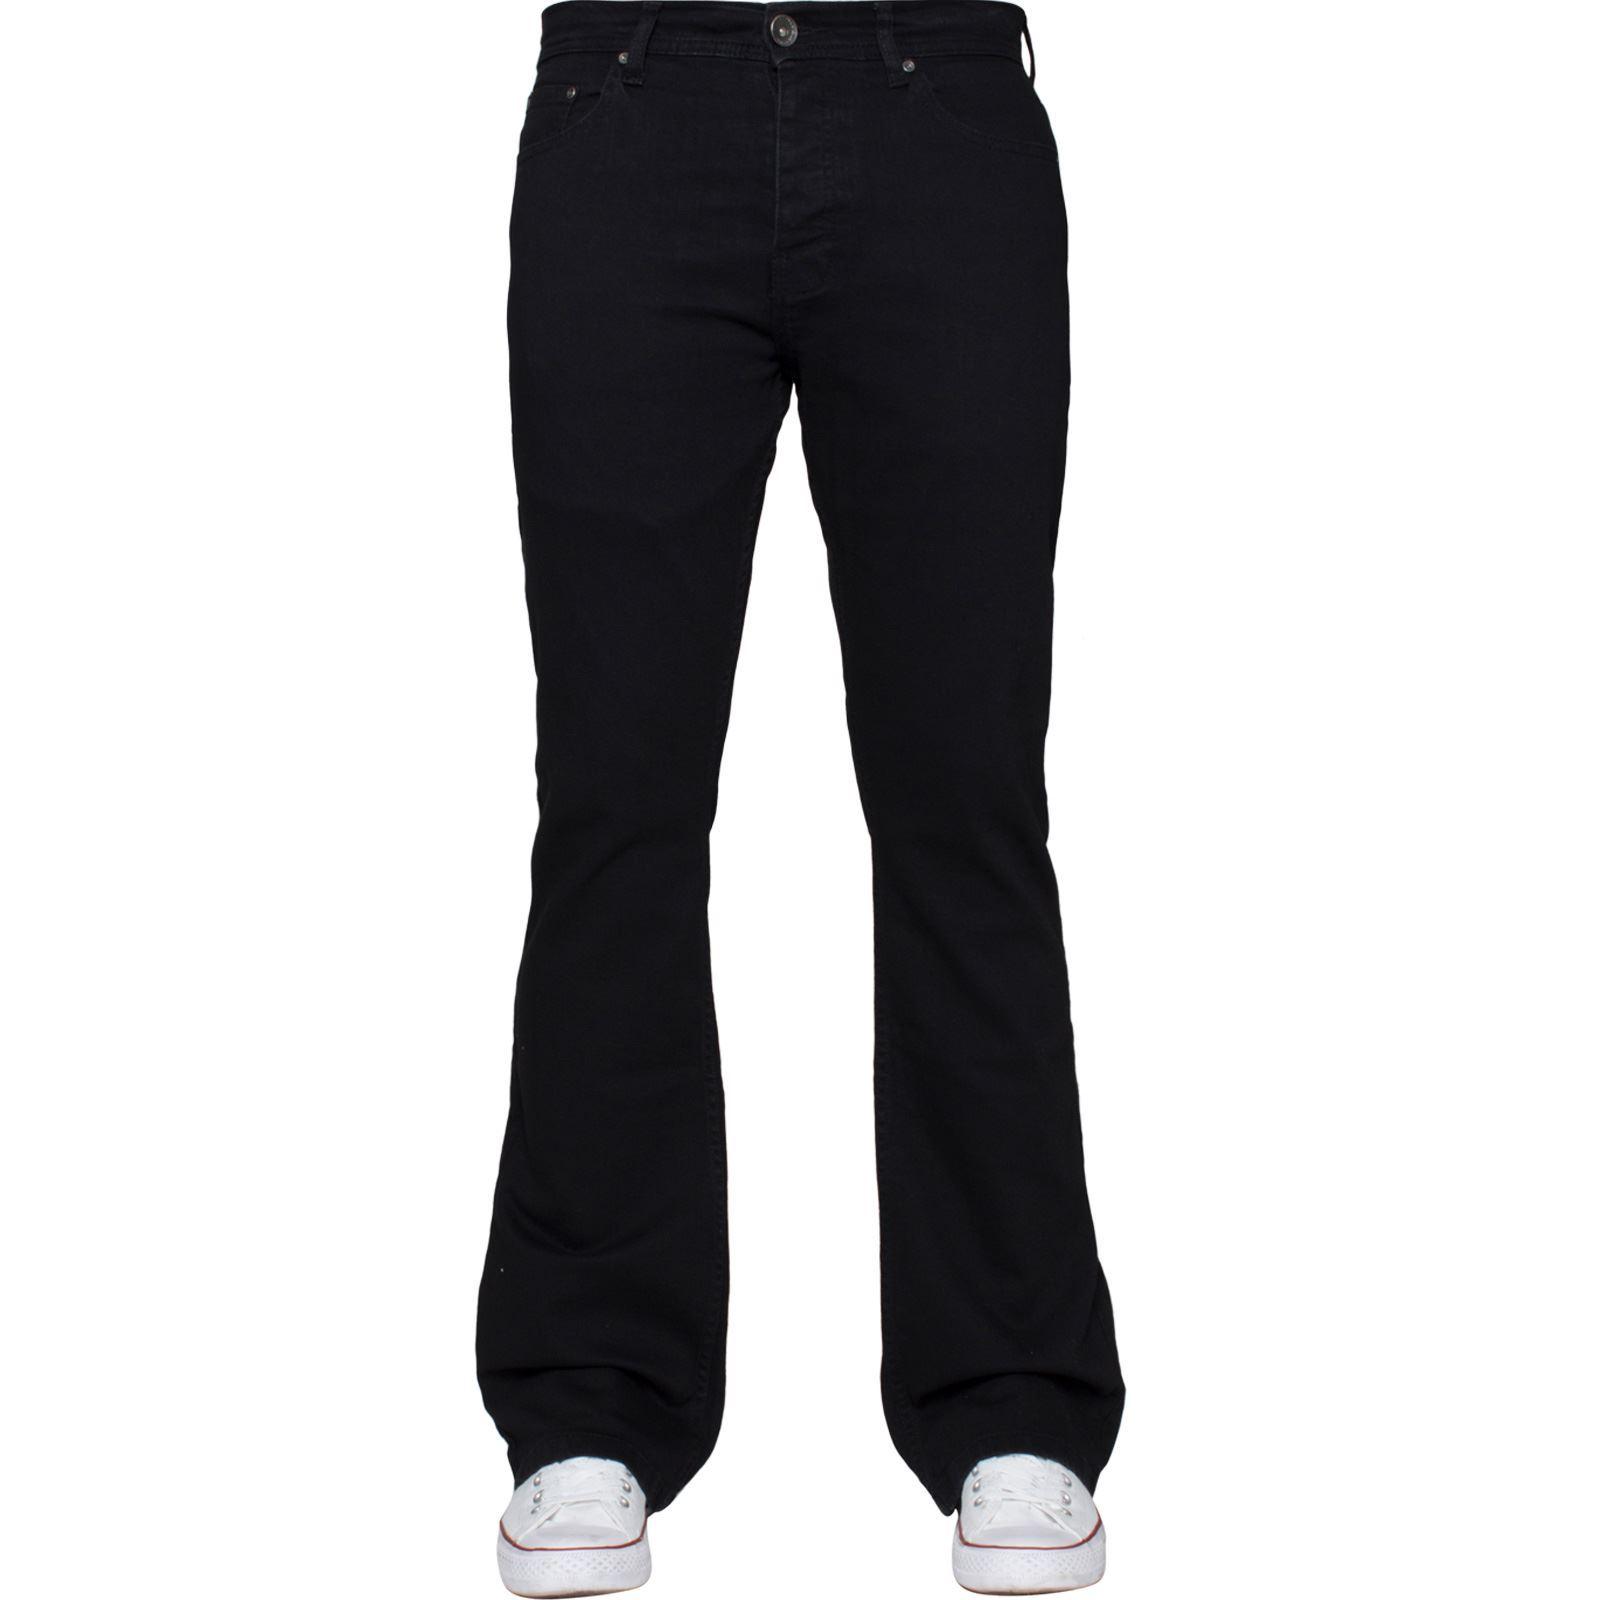 Para-Hombre-Pierna-Recta-Bootcut-Stretch-Denim-Regulares-Pantalon-de-trabajo-Kruze-Todas-Cinturas miniatura 70